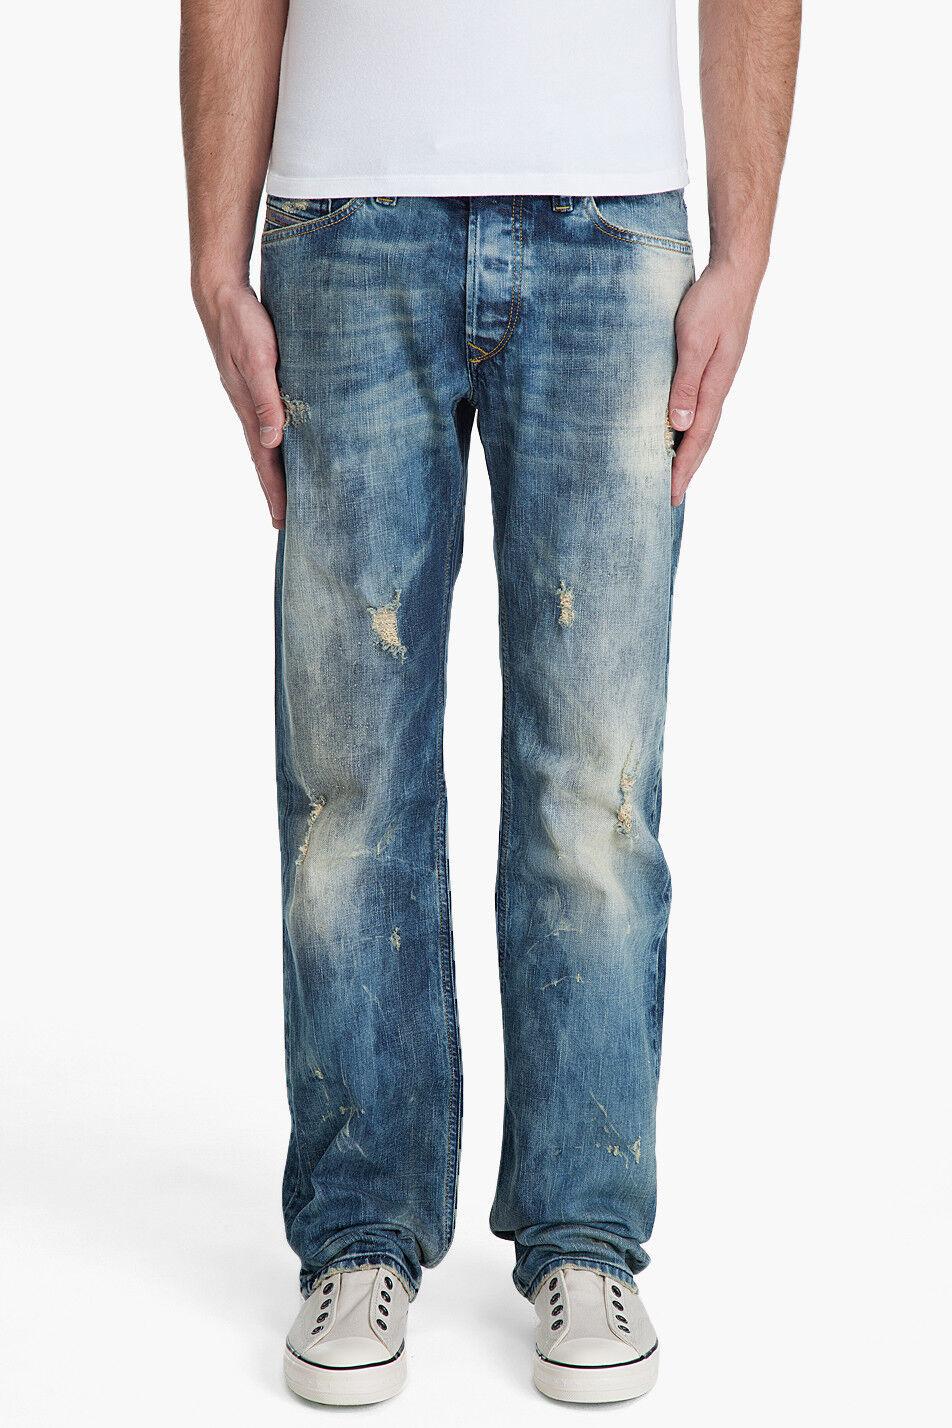 New Diesel Viker-R-Box 8N1_Stretch bluee Eyecons Straight Leg Jeans 28 32